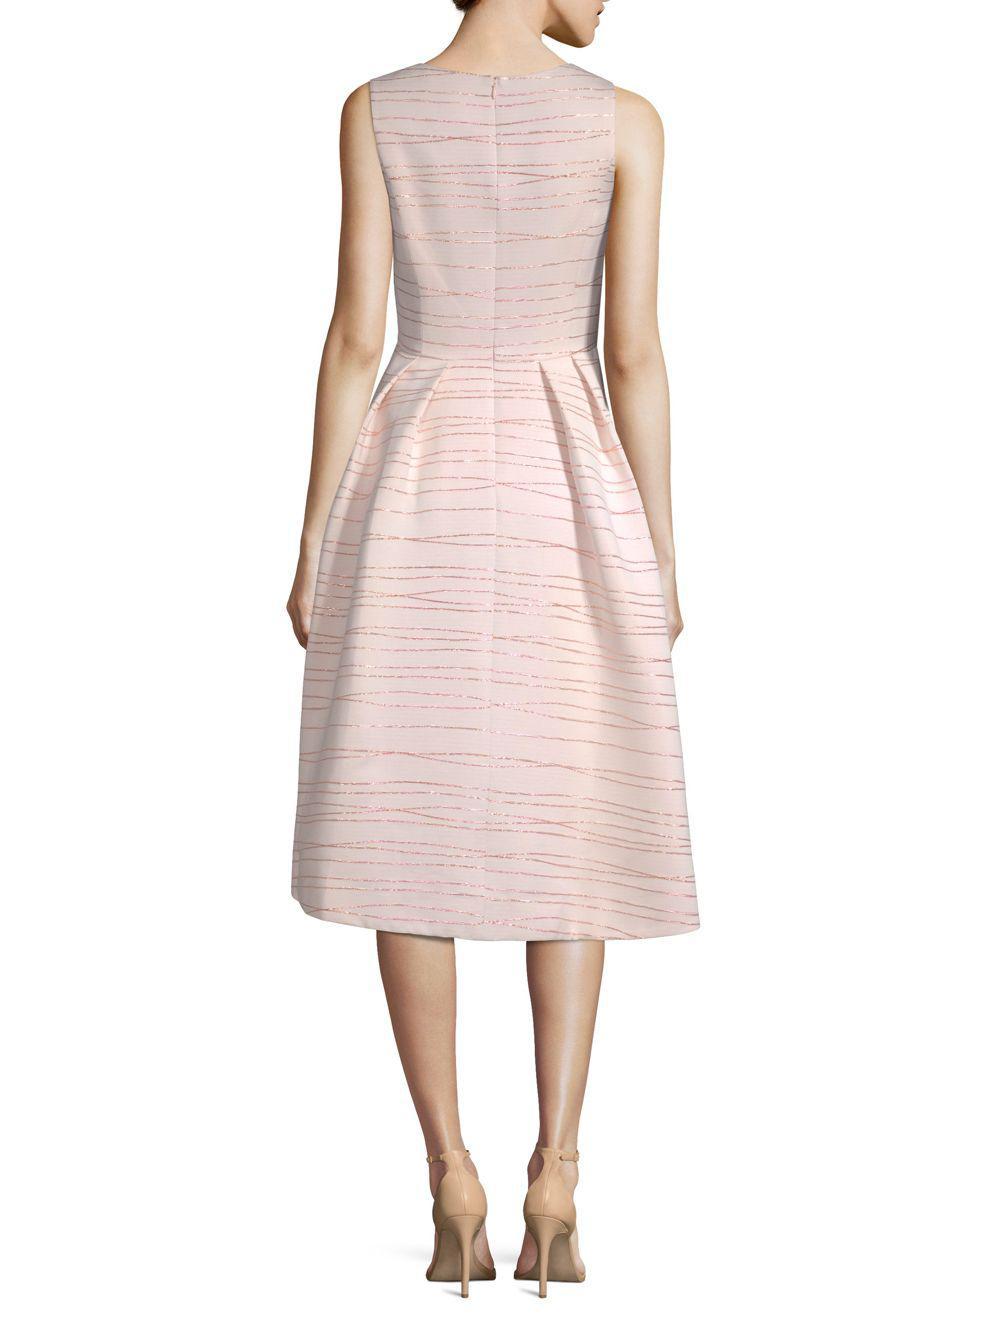 0ff20a1e95d7 Shoshanna Midnight Coraline Metallic Striped Jacquard Dress in Pink ...